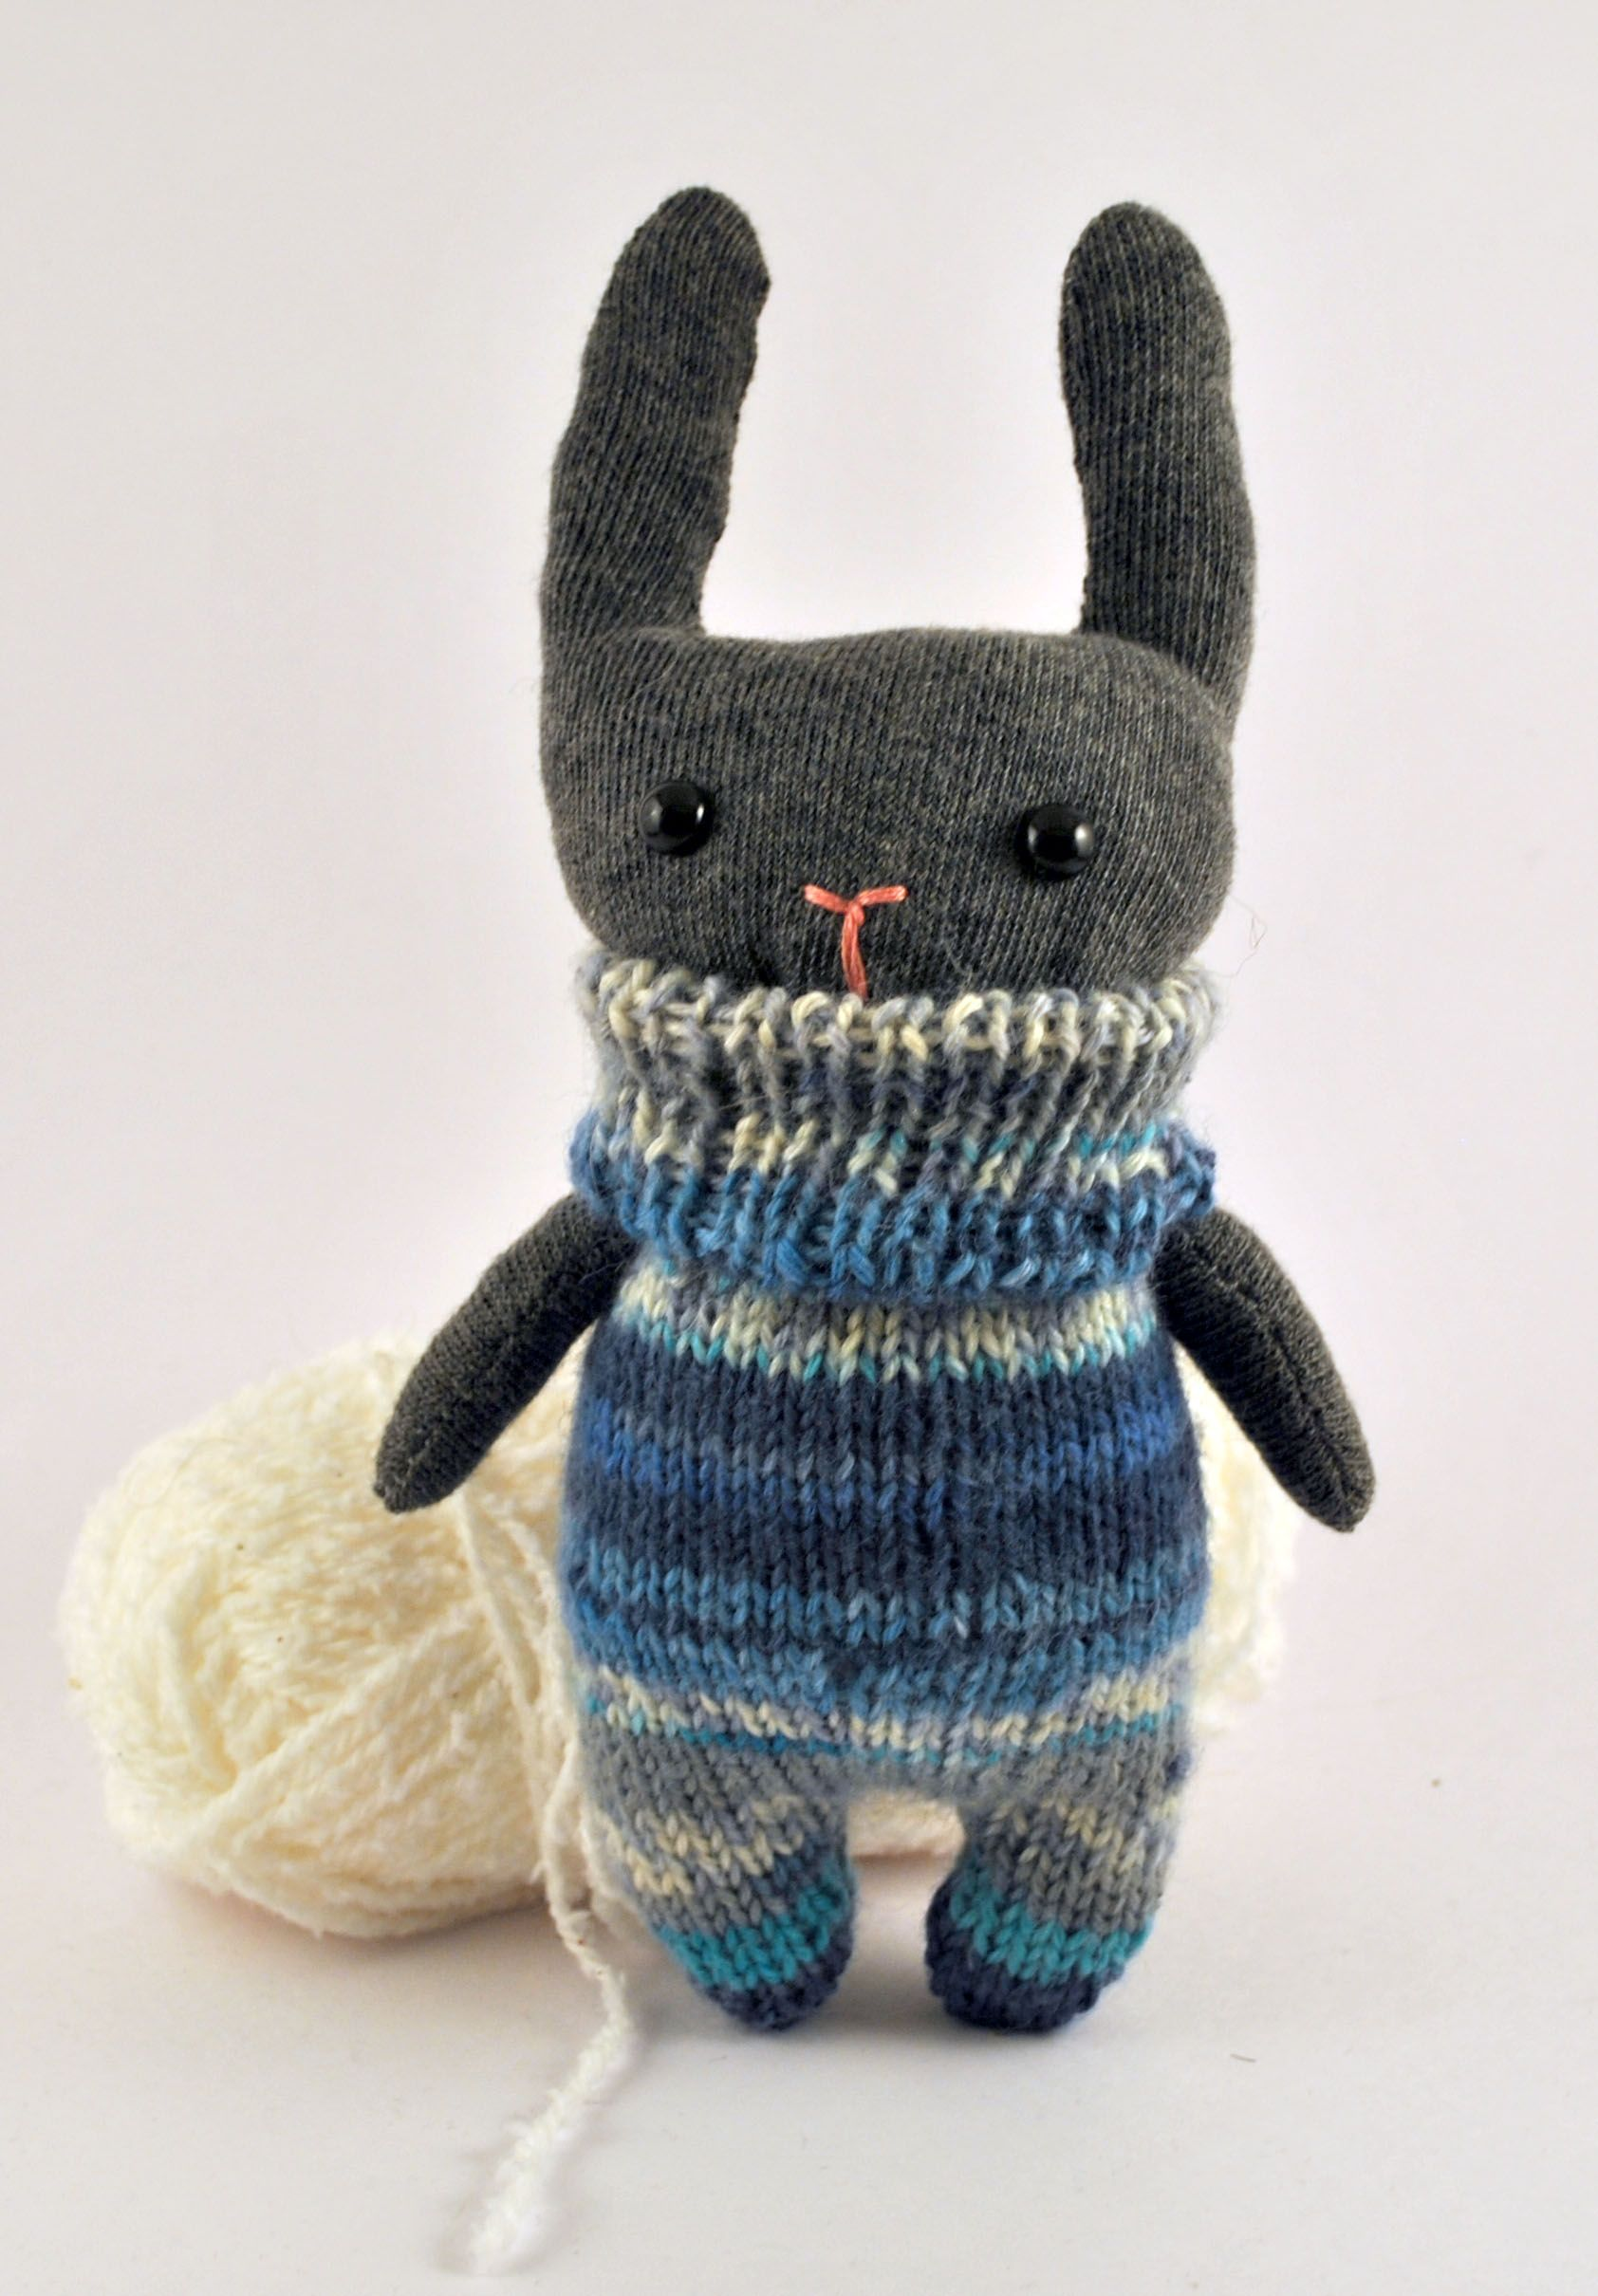 my first knitted bunny!     http://starsbythedoorstitching.files.wordpress.com/2013/01/bunny-41.jpg